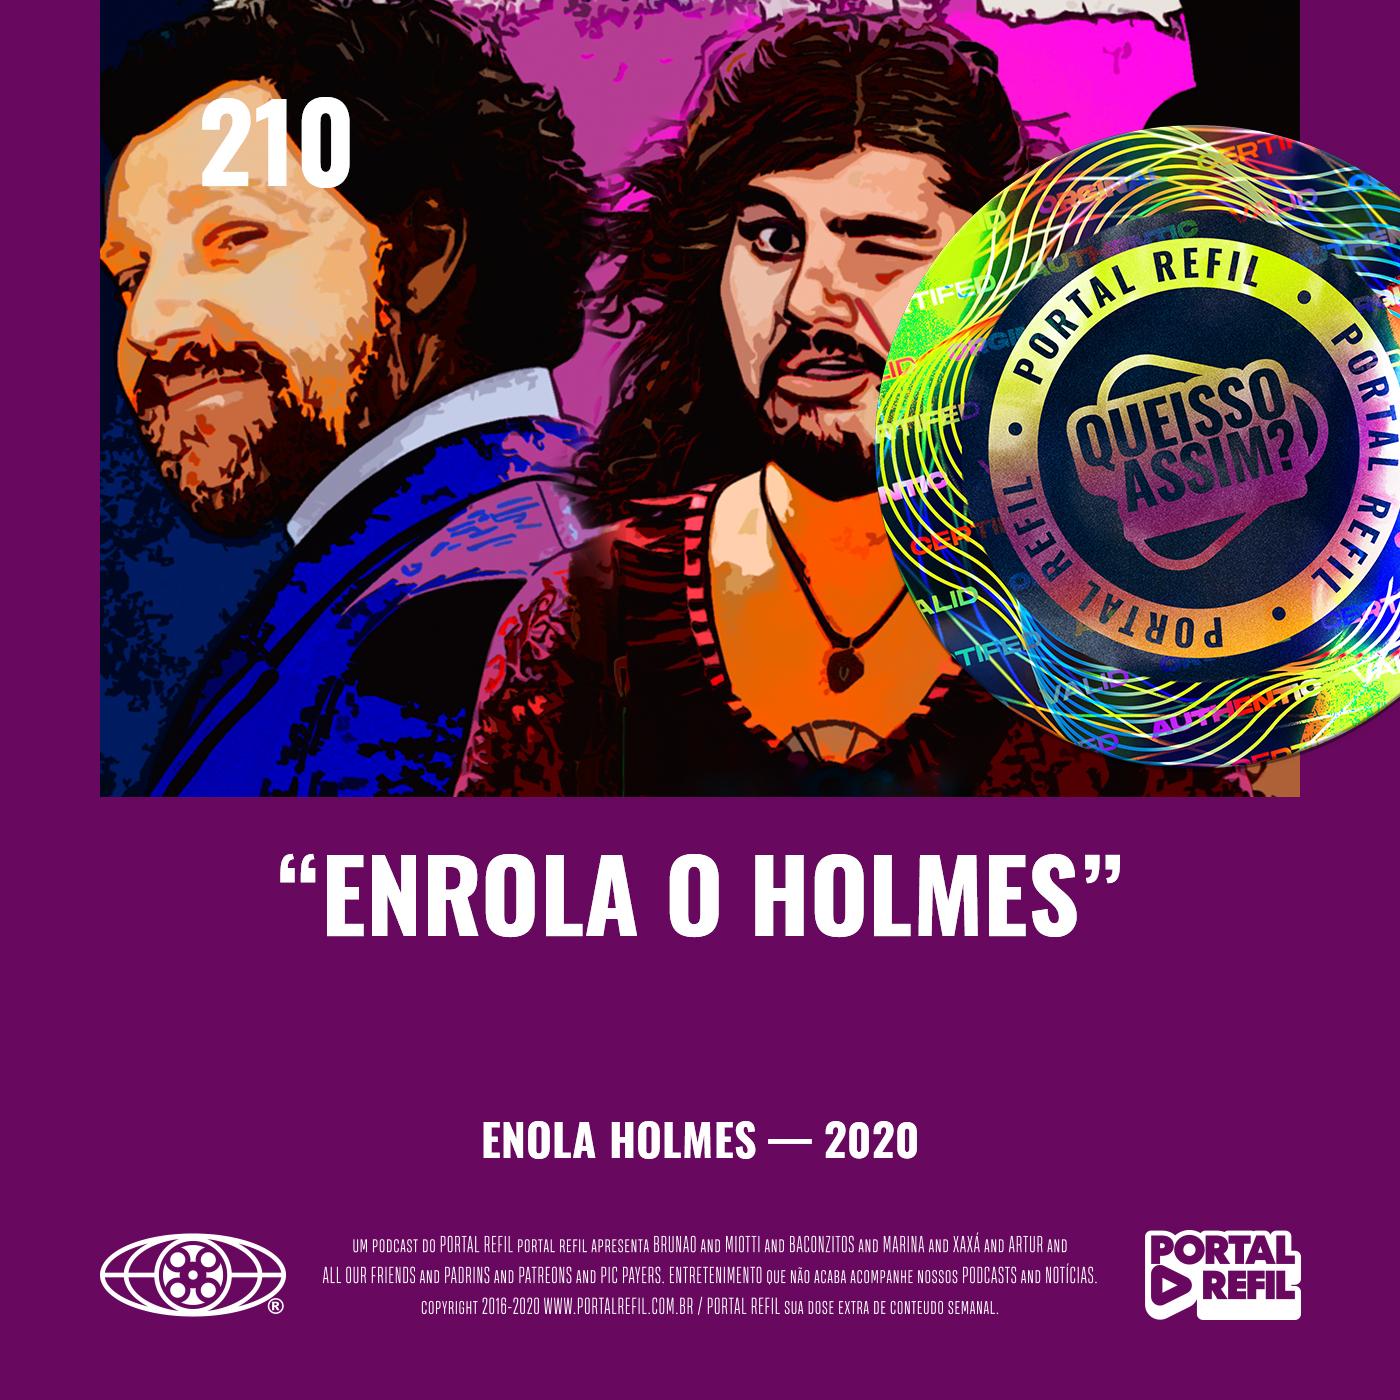 QueIssoAssim 210 – Enrola o Holmes (Enola Holmes – Netflix)